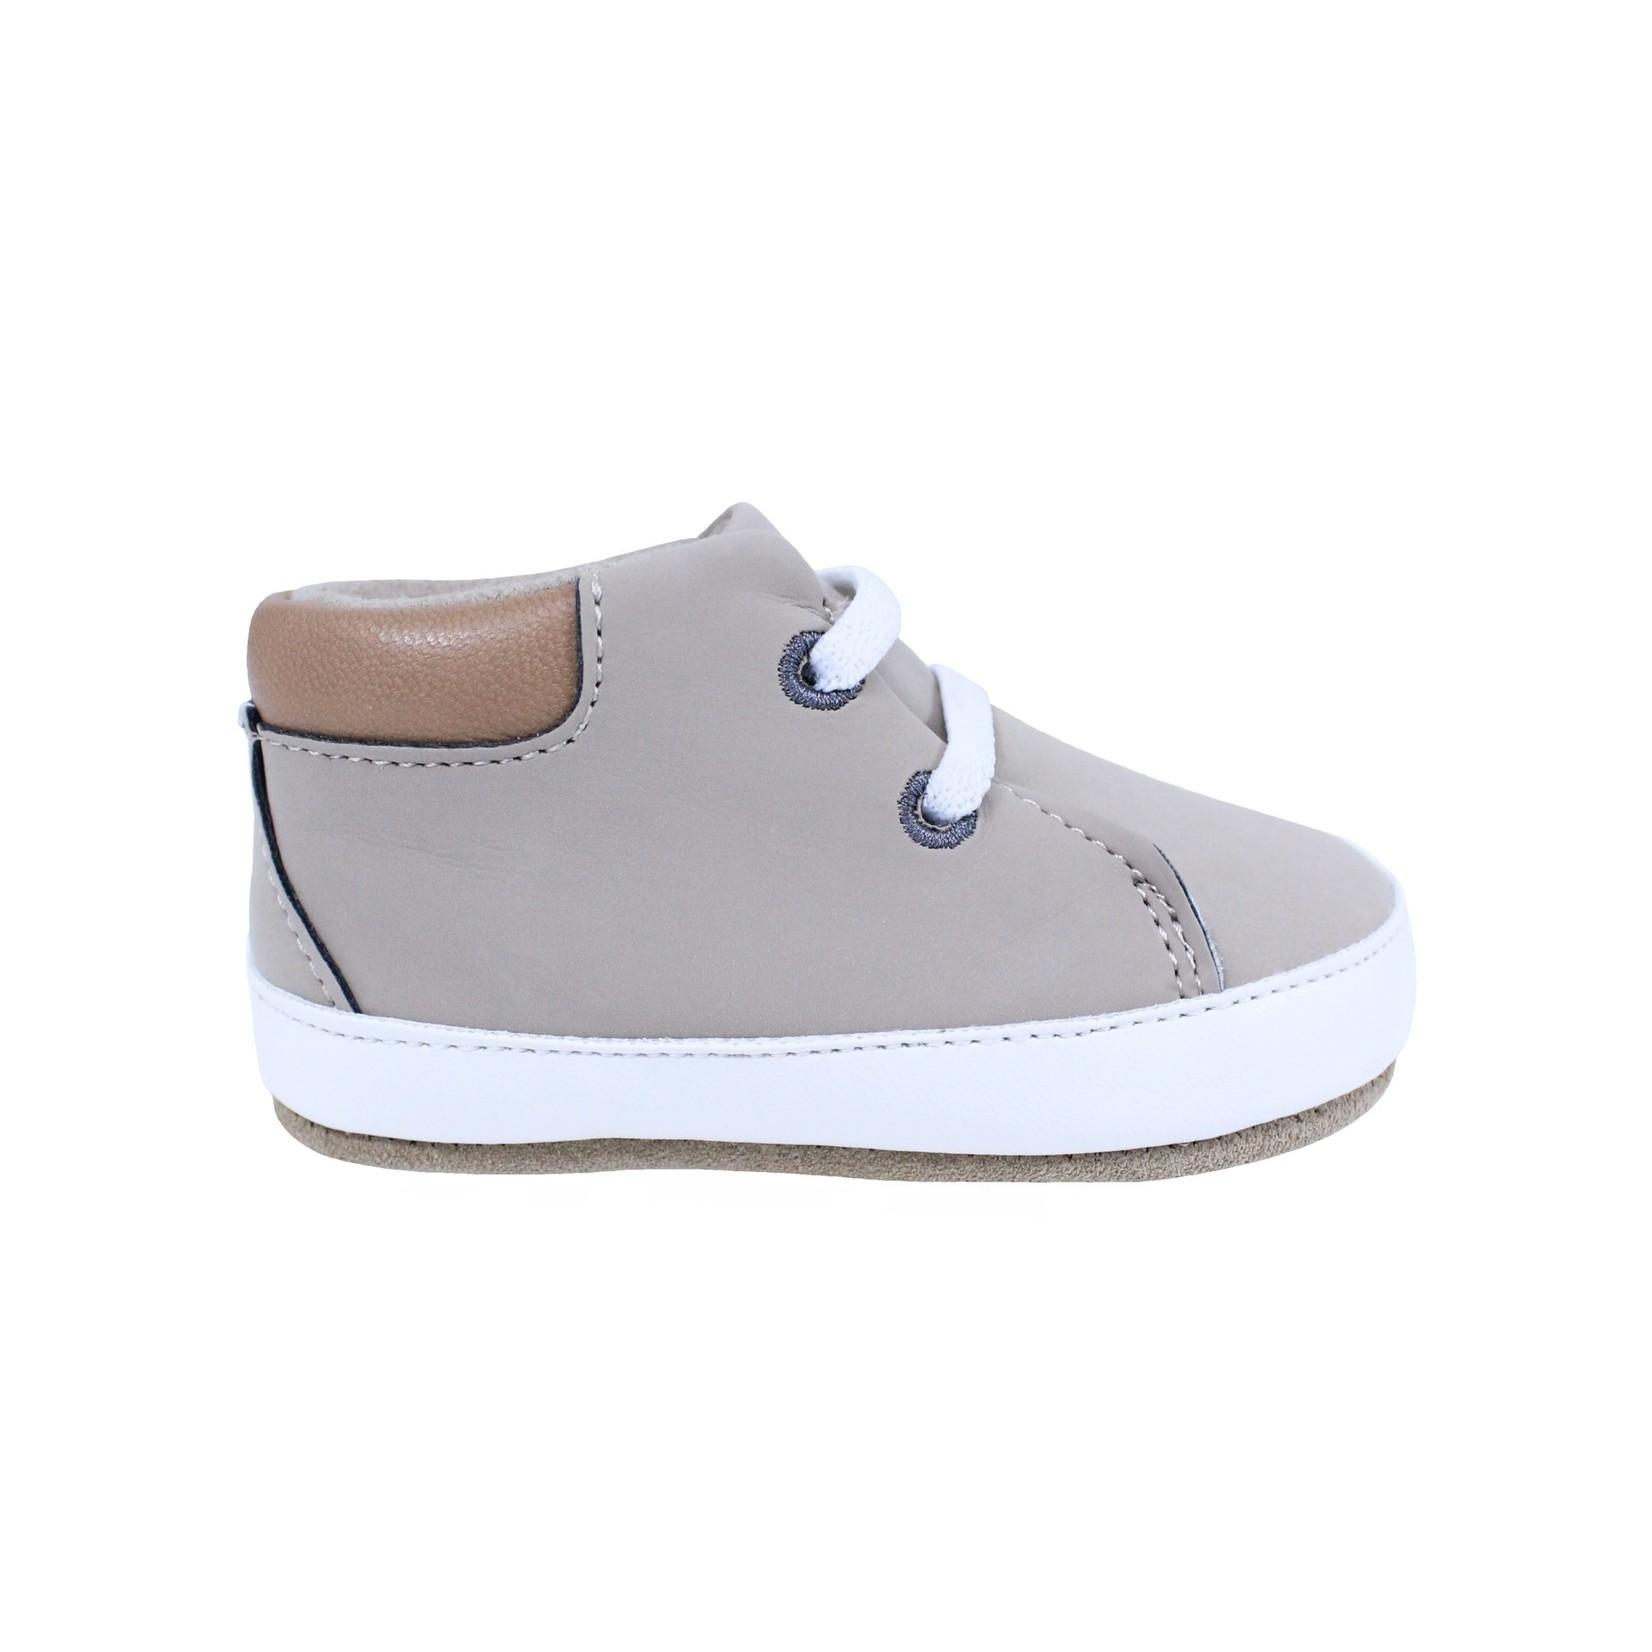 Robeez First Kicks - Jensen Grey Tan